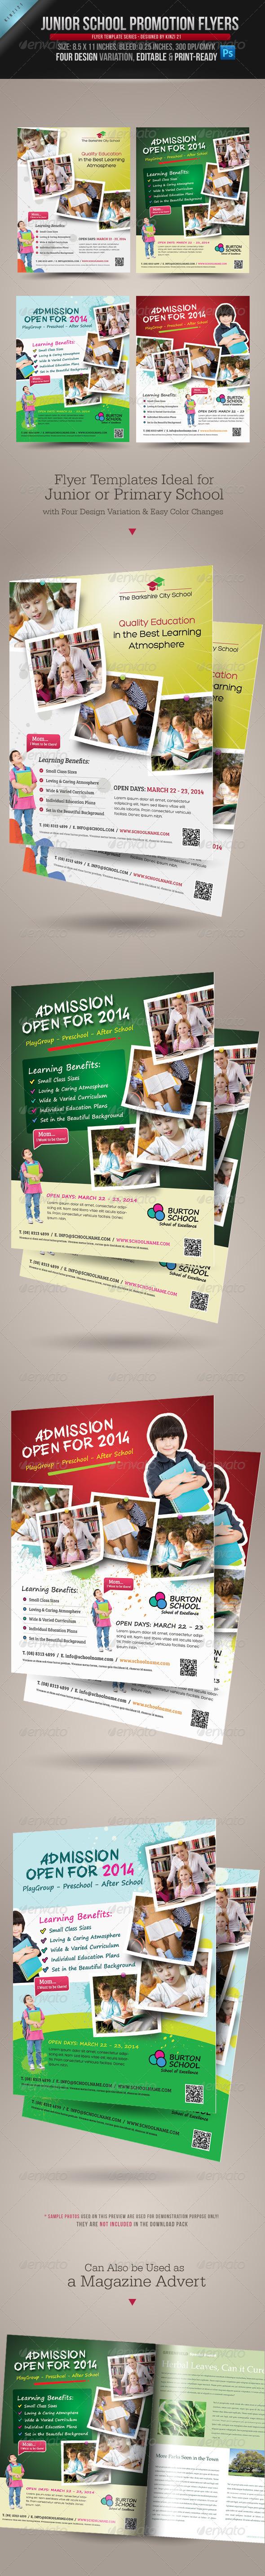 GraphicRiver Junior School Promotion Flyers 4170610